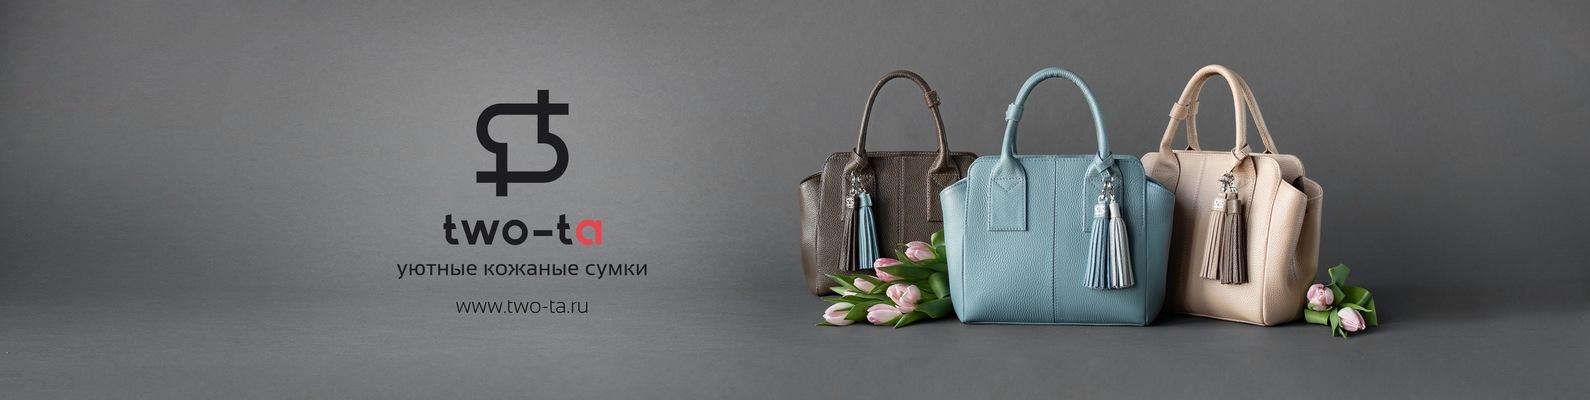 a7ee4a94d91b ○ two-ta |уютные кожаные сумки|○ | ВКонтакте